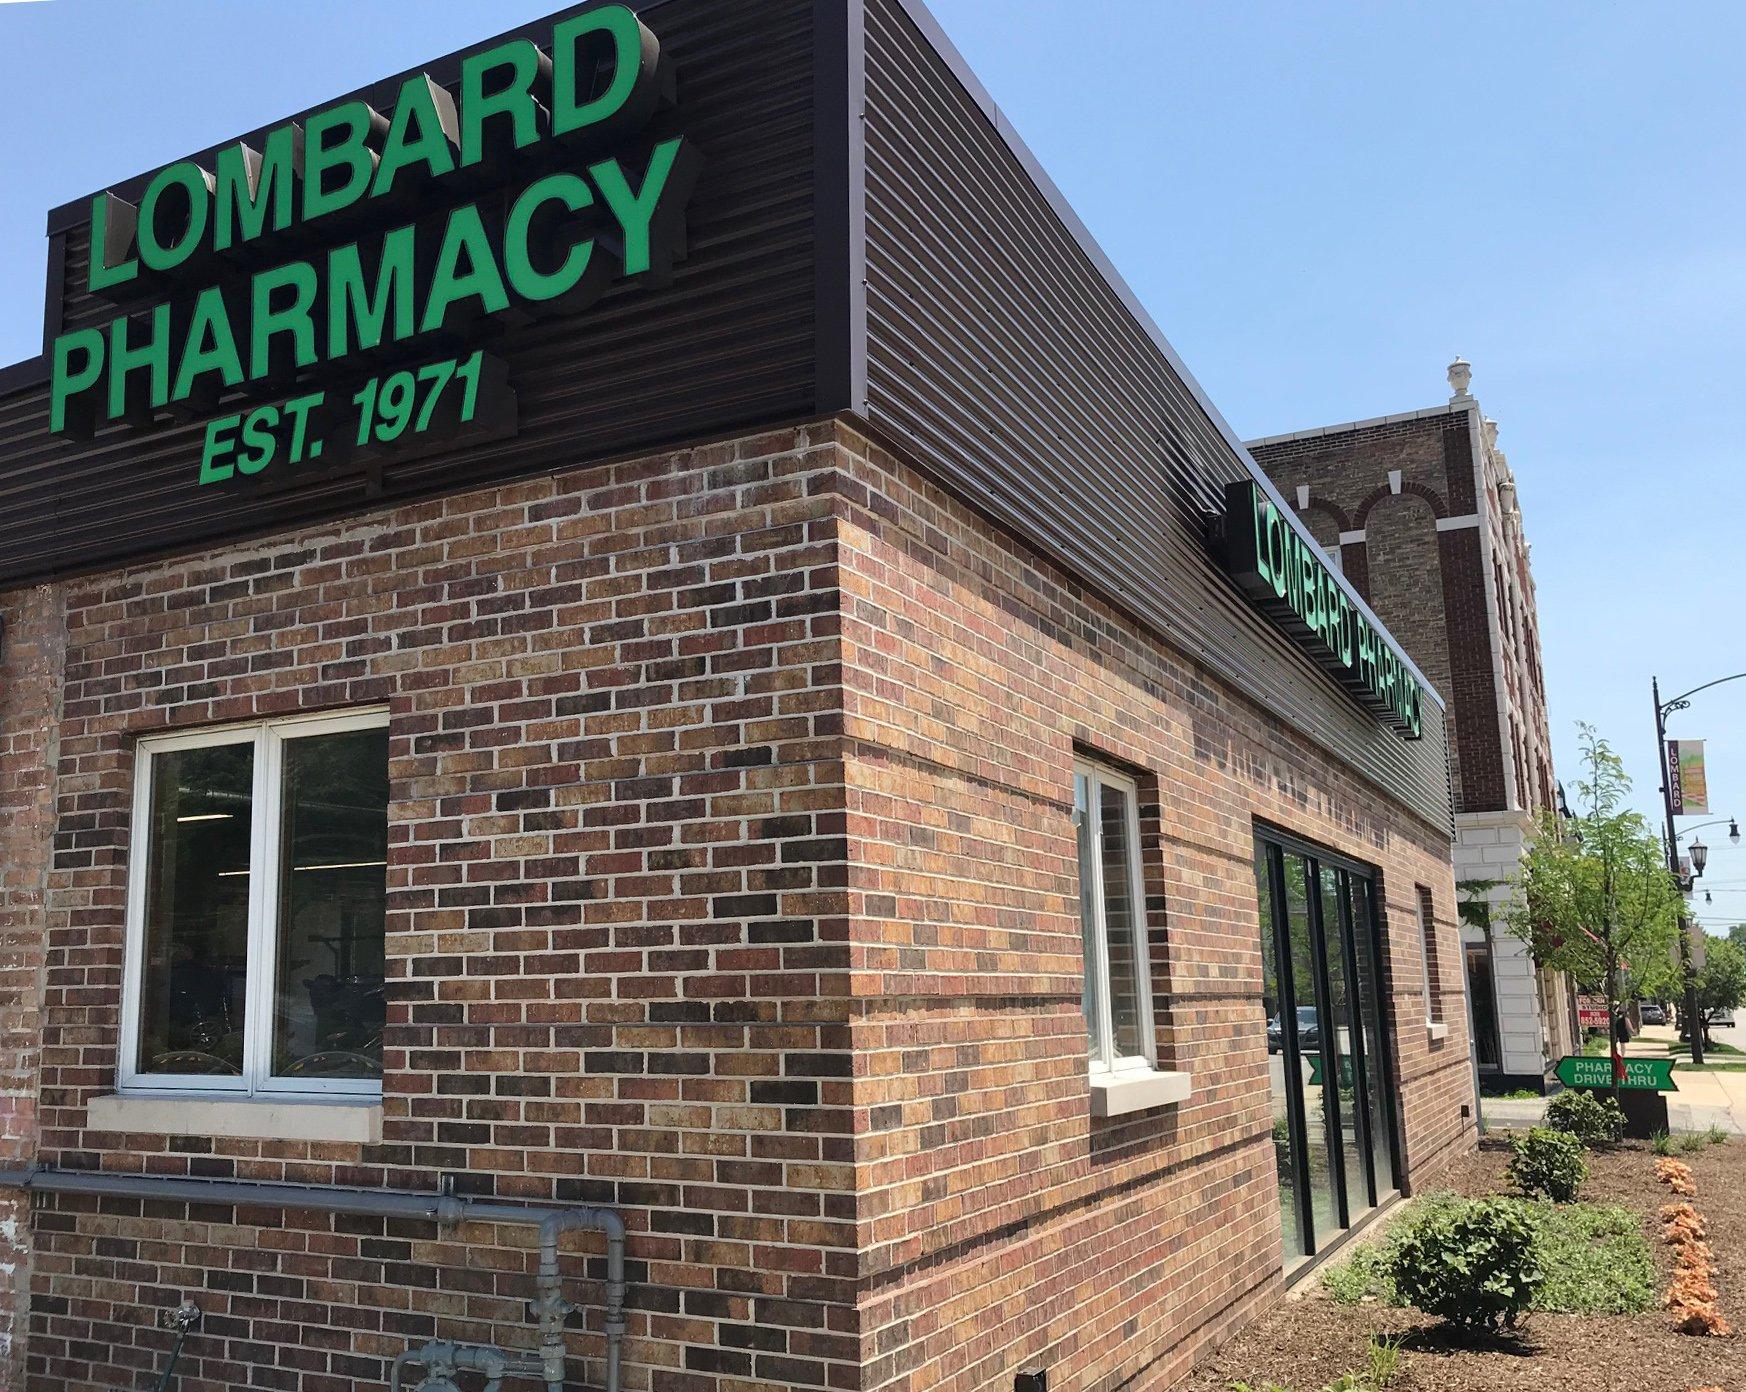 Lombard-Pharmacy-Cropt